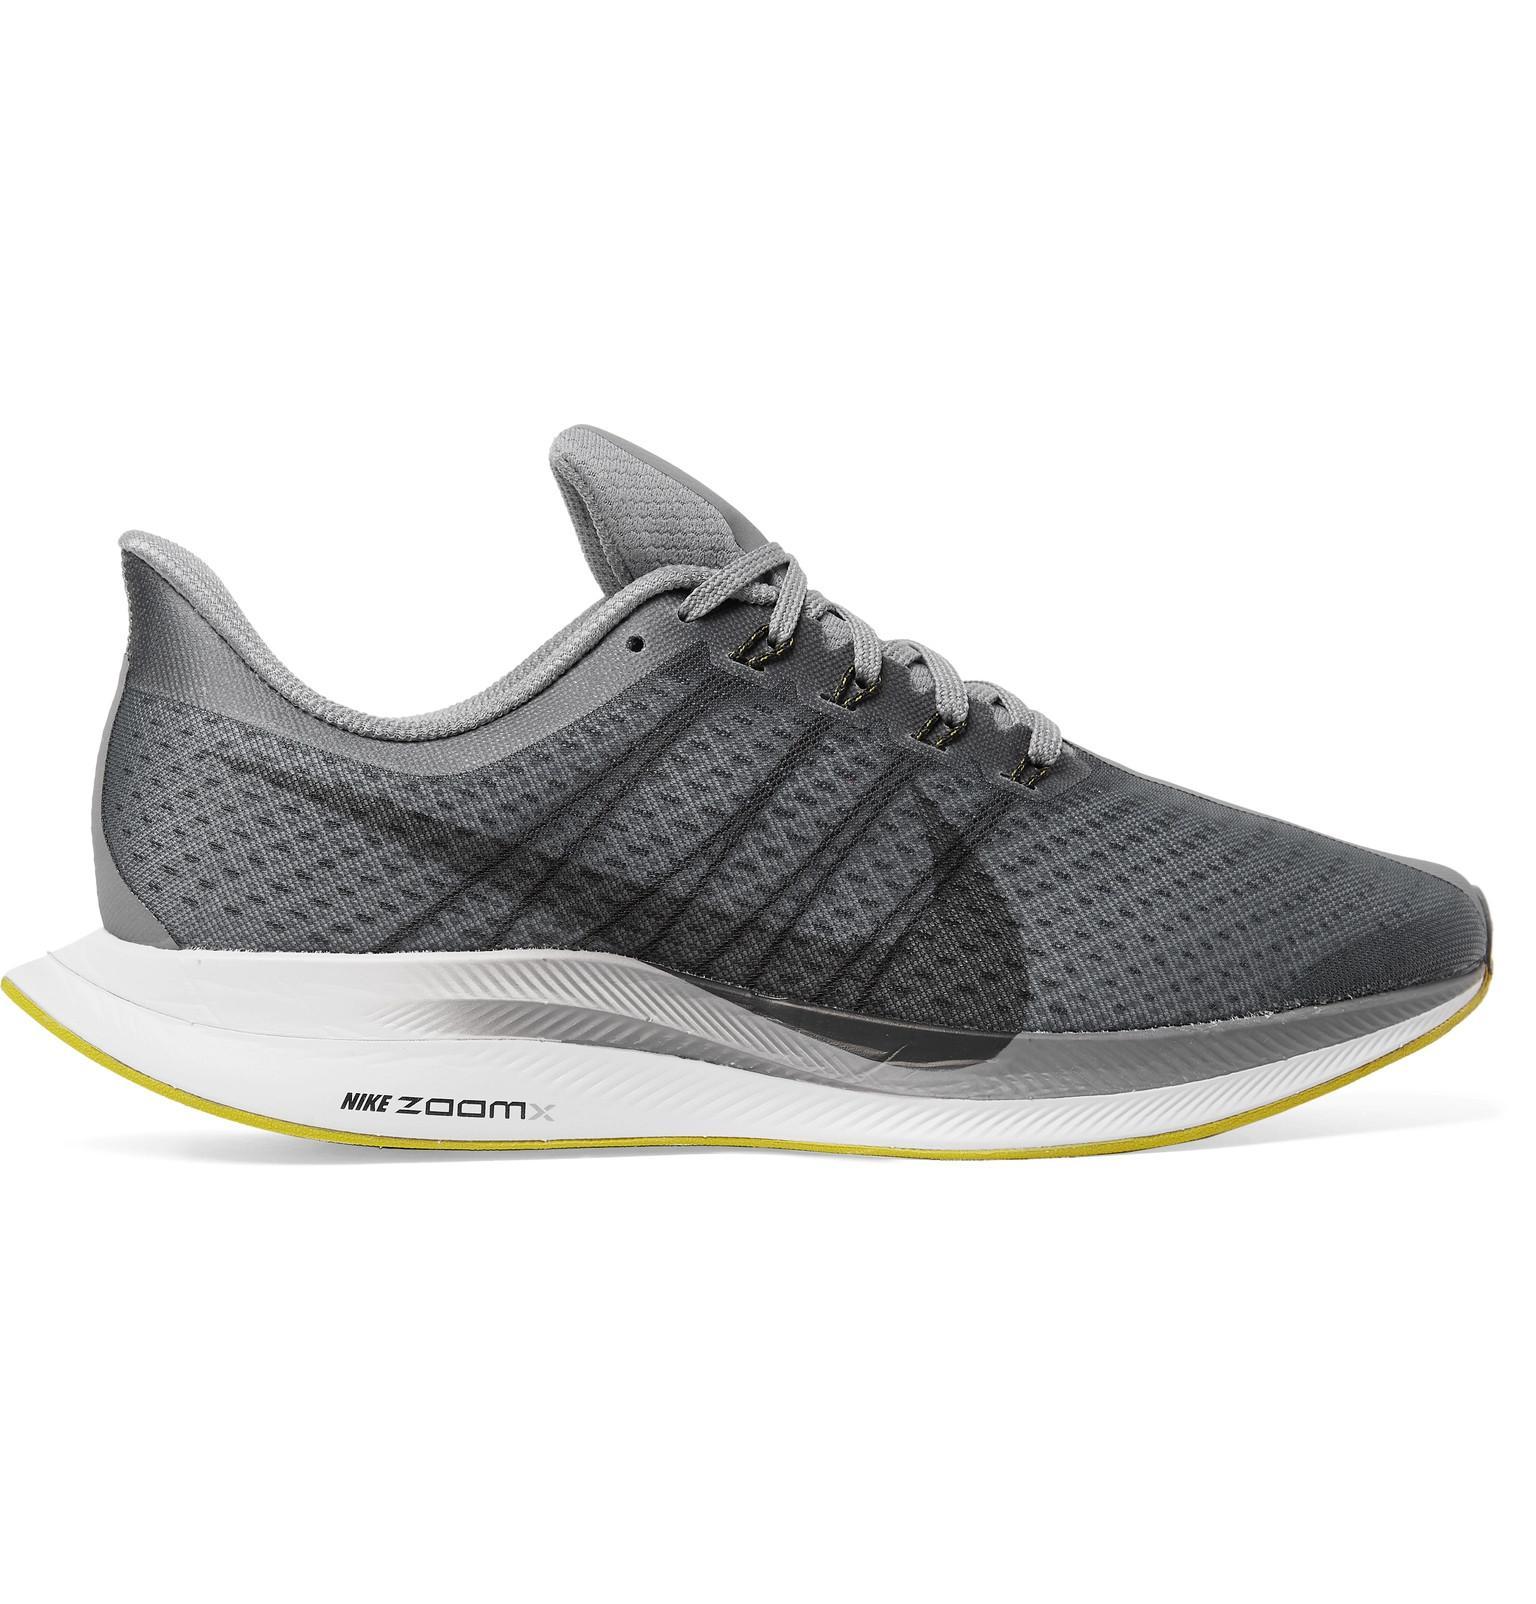 9f82cb8befab Nike Nike Air Zoom Pegasus 35 Turbo Mesh Sneakers in Gray for Men - Lyst